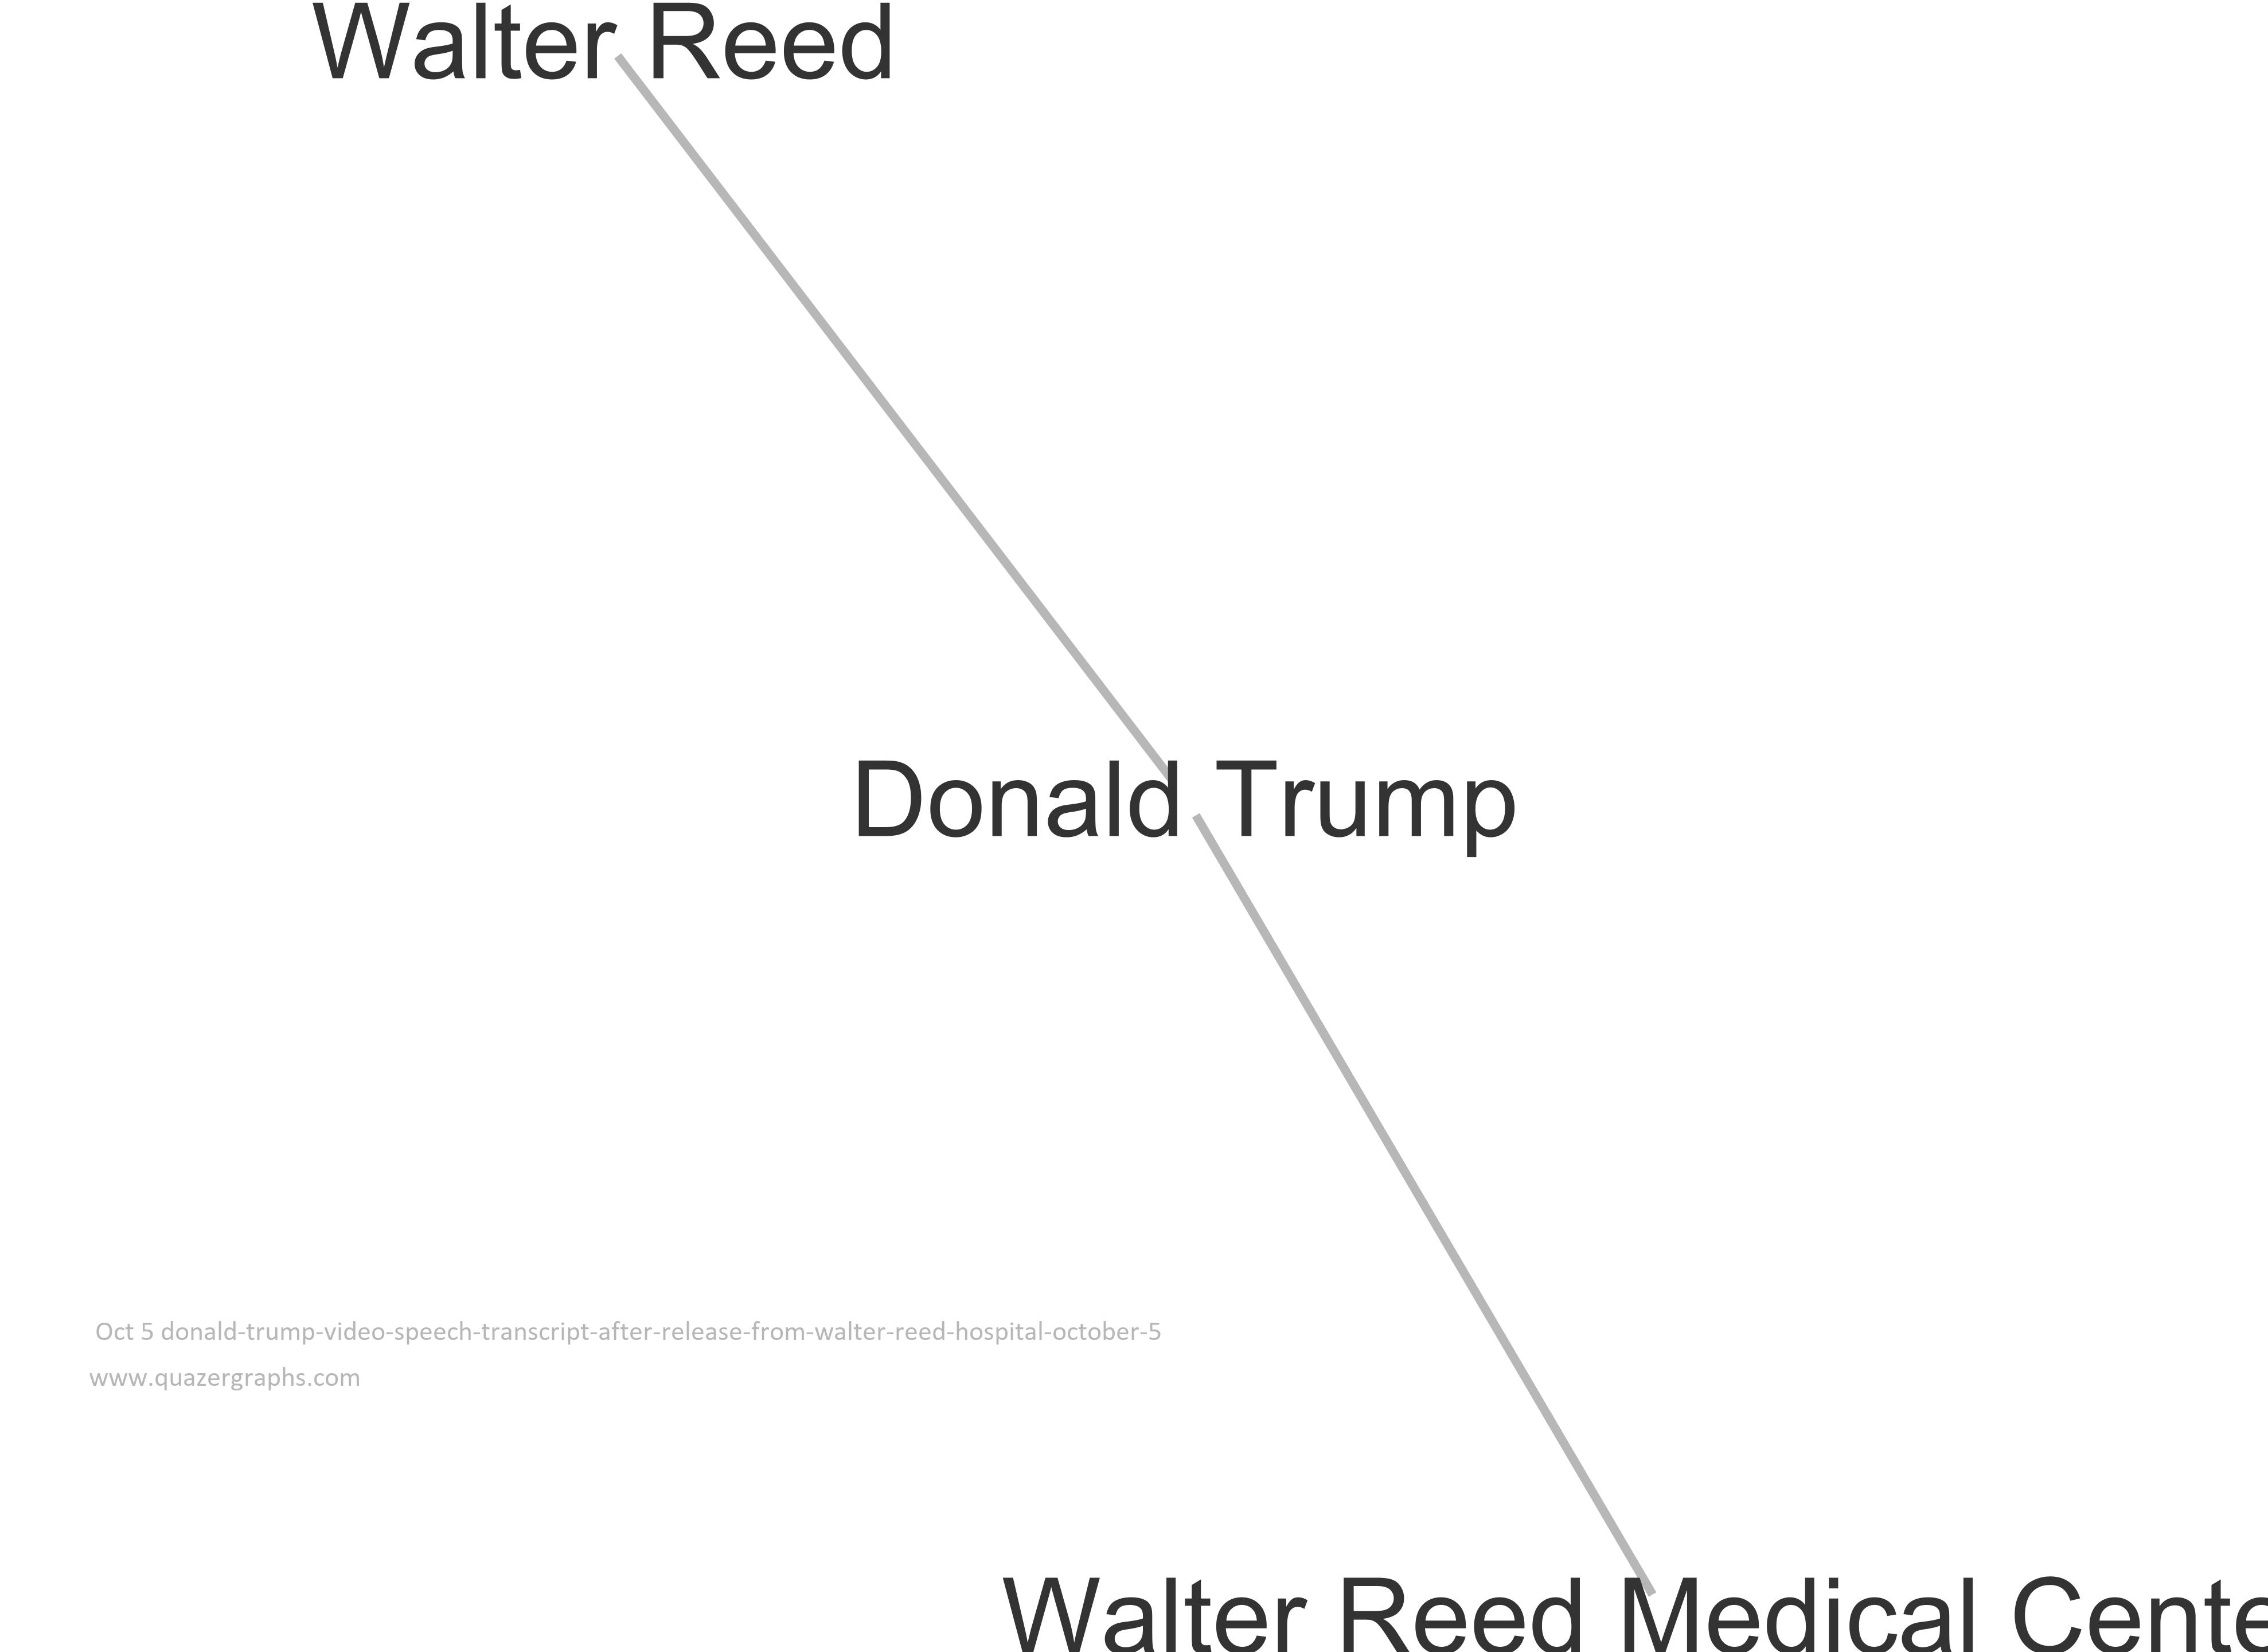 Oct 5 donald-trump-video-speech-transcript-after-release-from-walter-reed-hospital-october-5